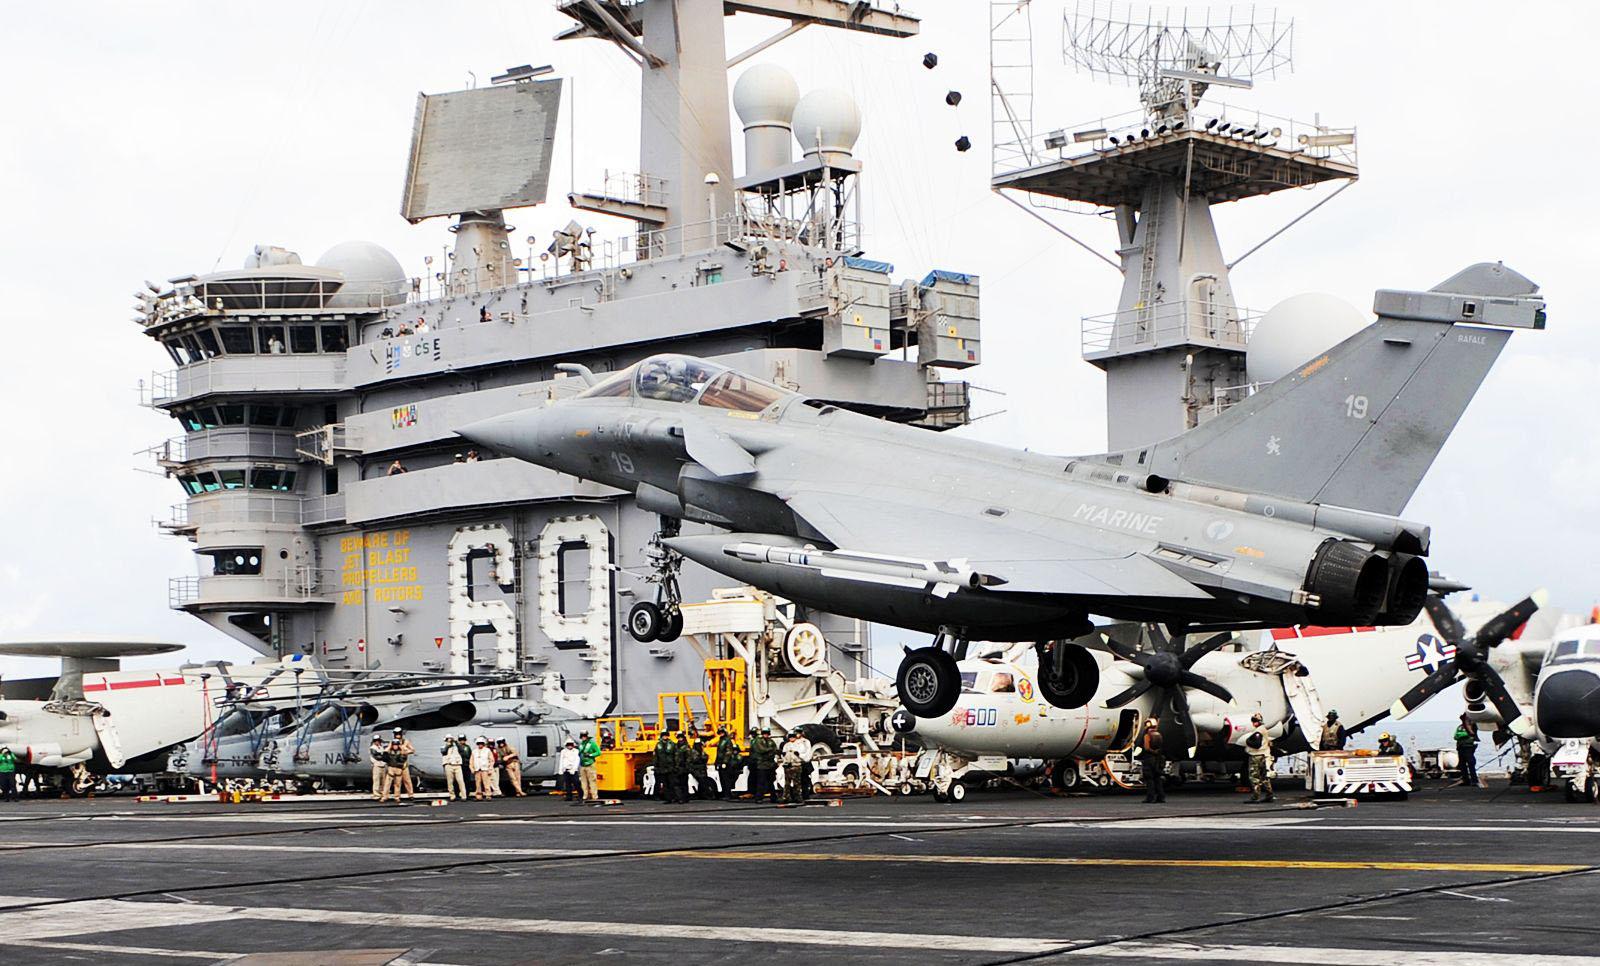 https://i1.wp.com/www.naval.com.br/blog/wp-content/uploads/2009/07/rafale-eisenhower-2.jpg